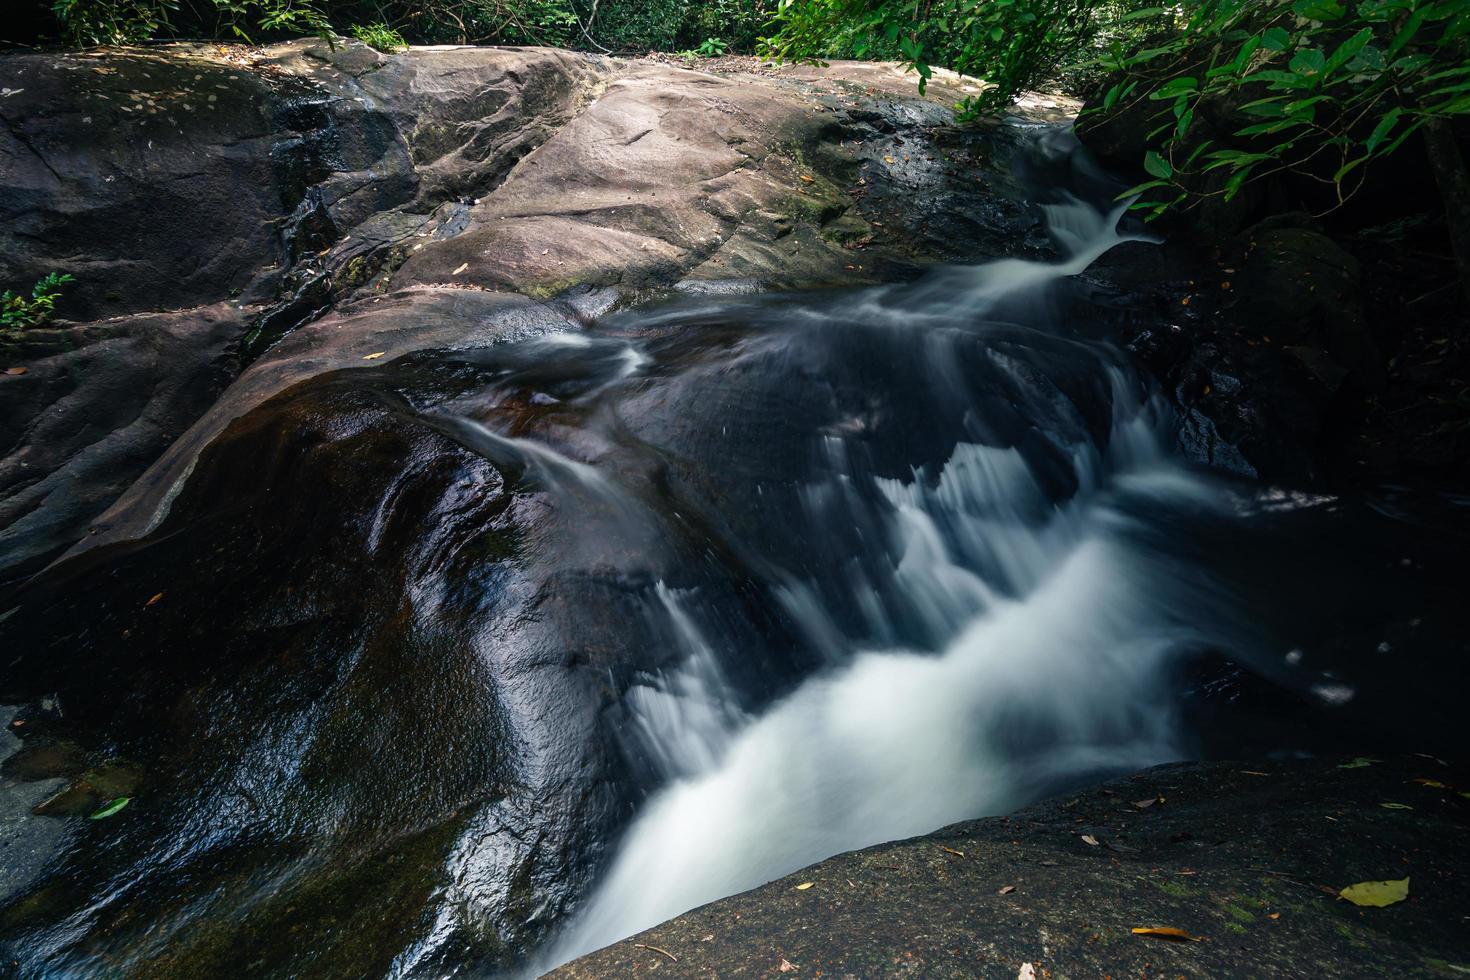 cascata di khlong pla kang in thailandia foto